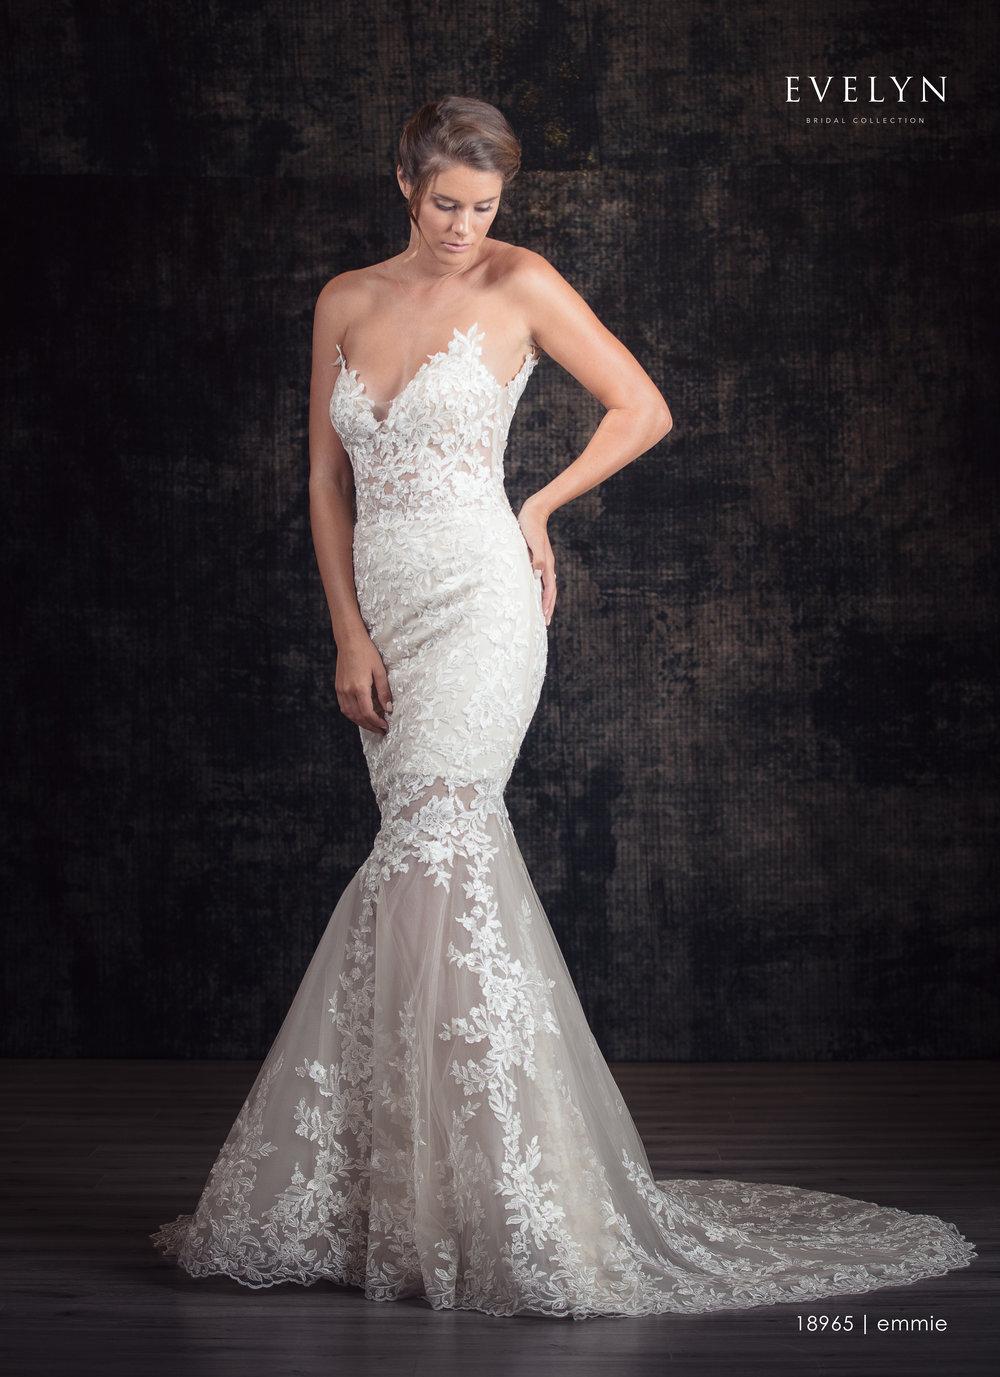 emmie-evelyn-bridal-ivory-and-beau-savannah-bridal-boutique-savannah-wedding-dresses-savannah-bridal-shop-savannah-wedding-dresses.jpg